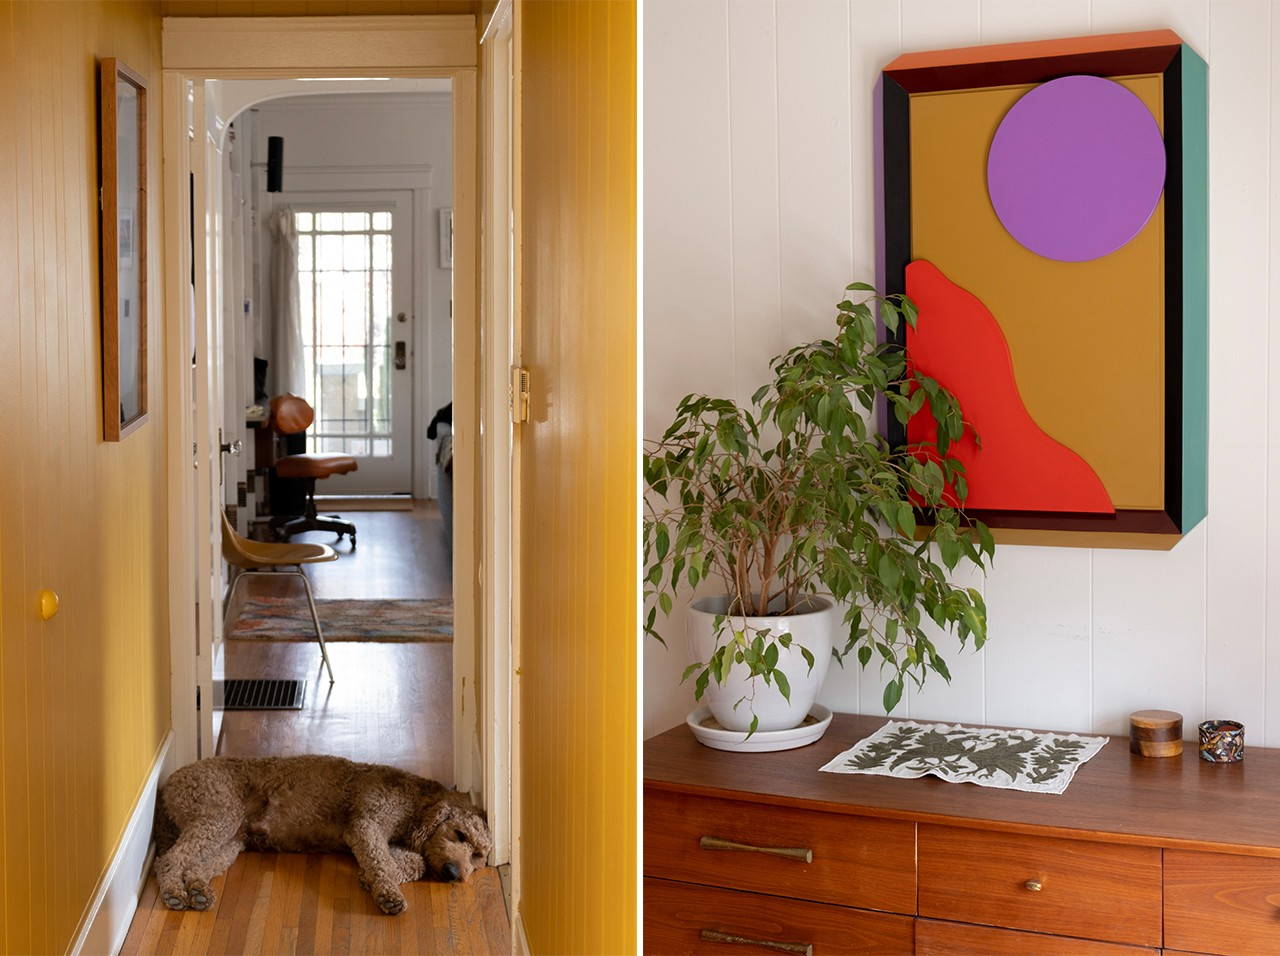 Adi Goodrich Sing-Sing Studio Founder Spatial Designer Home Tour Los Angeles LA House Bedroom Painting Wall Art Lamps Indoor Plants Houseplants